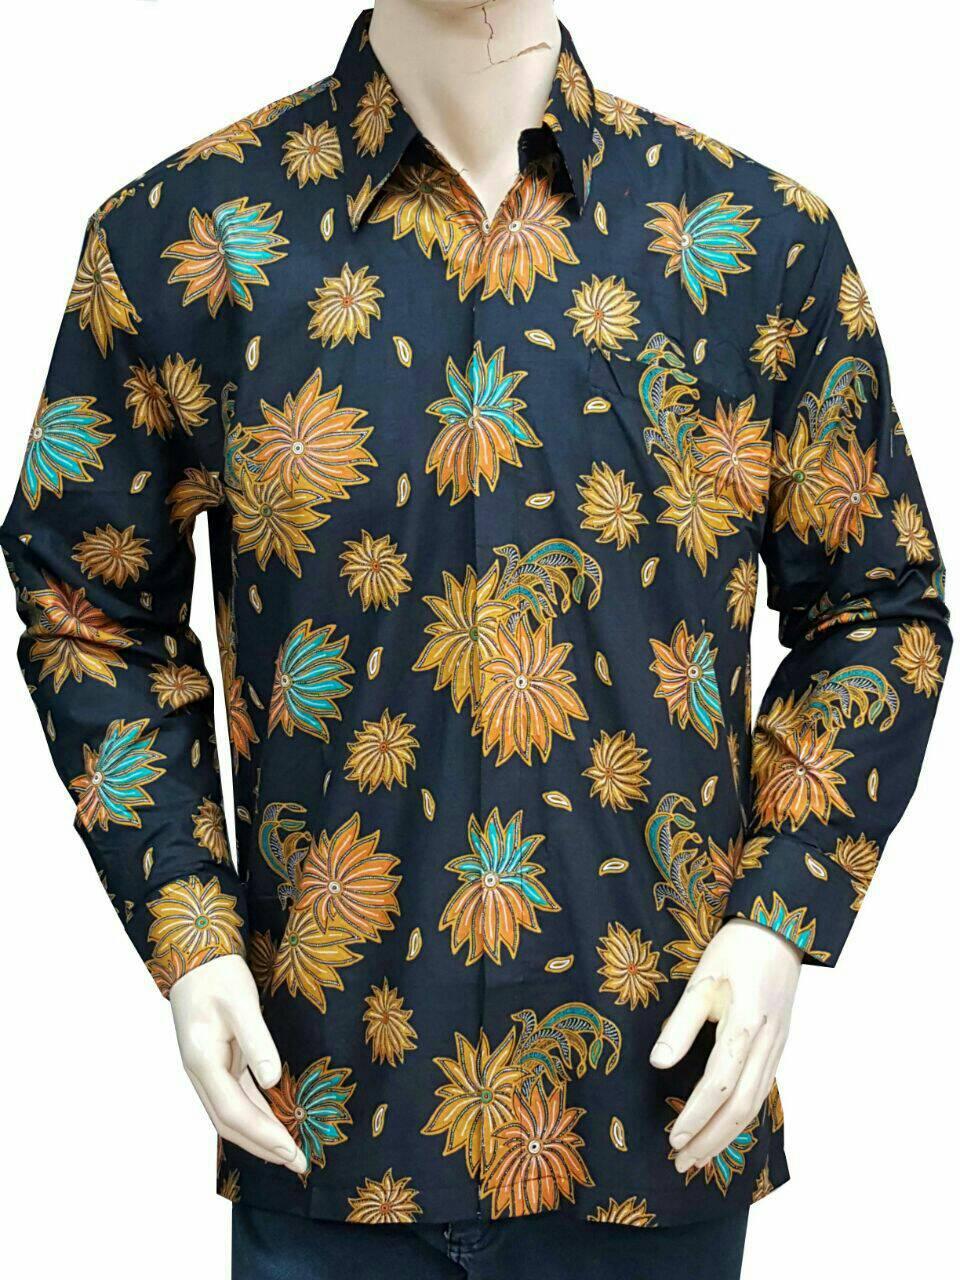 Features Atasan Blouse Batik Wanita Blus Kerja Lengan Panjang adb9ed4e2c